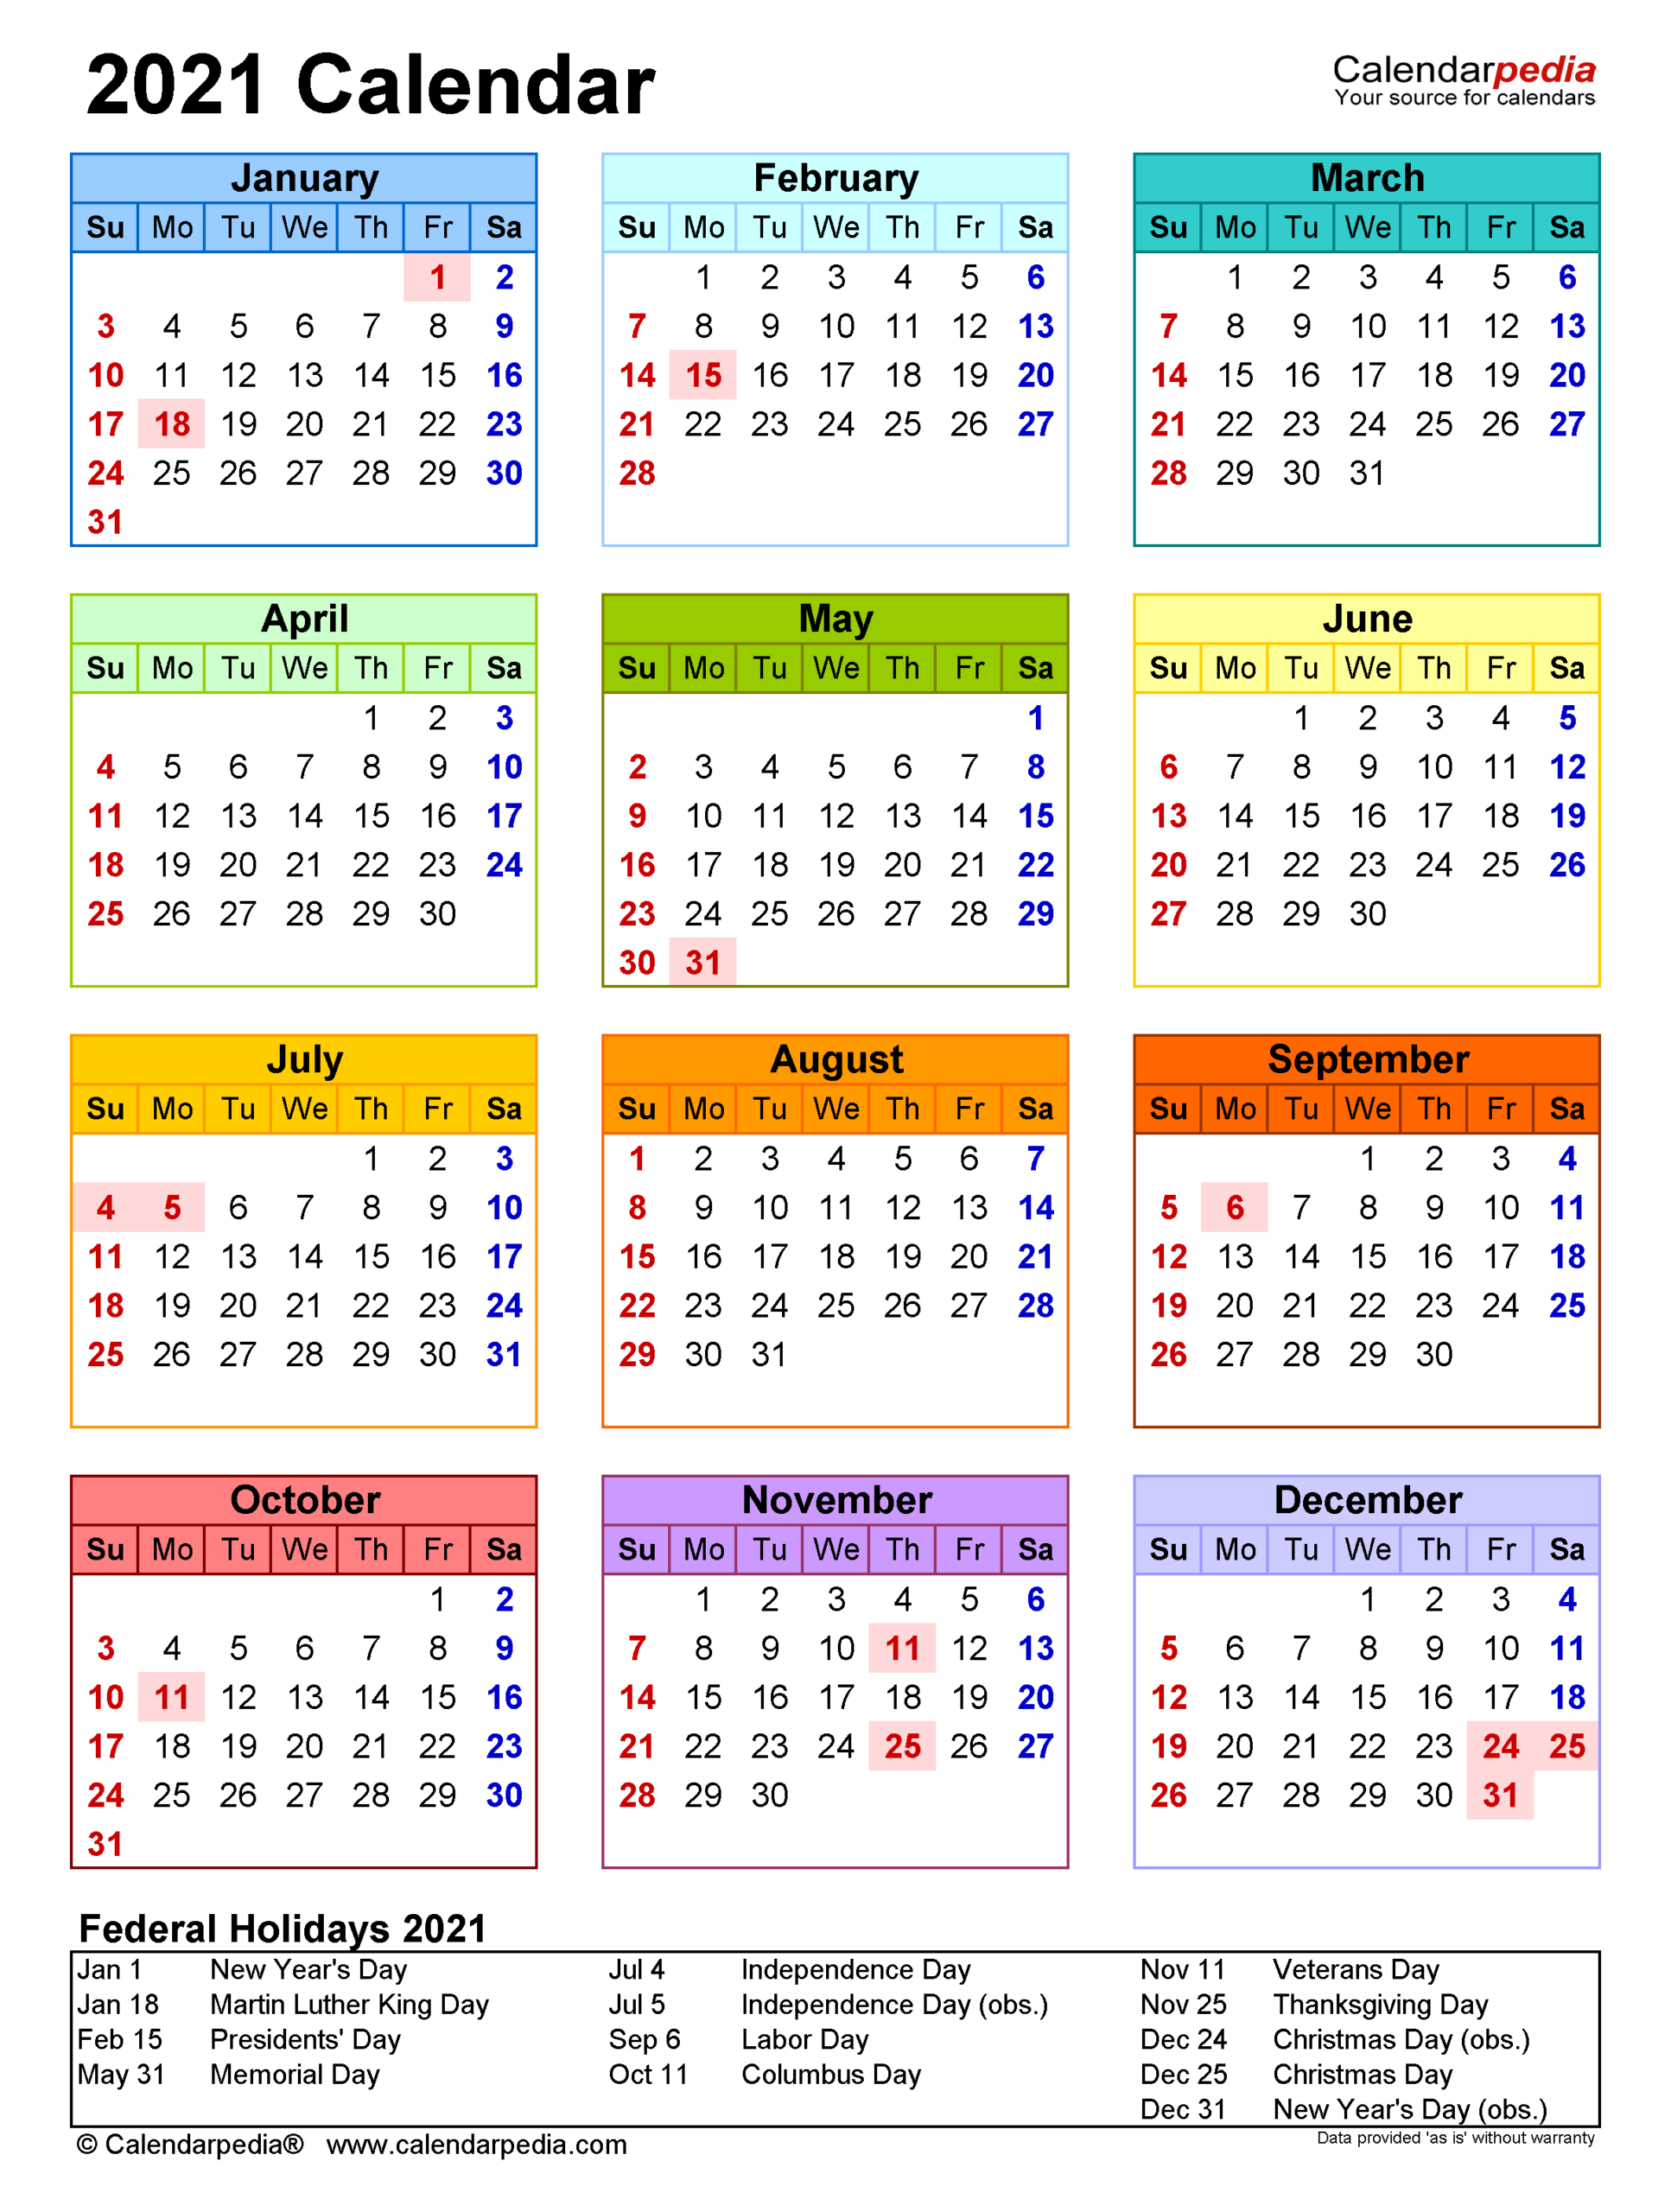 2021 Calendar Printable With Federal Holidays